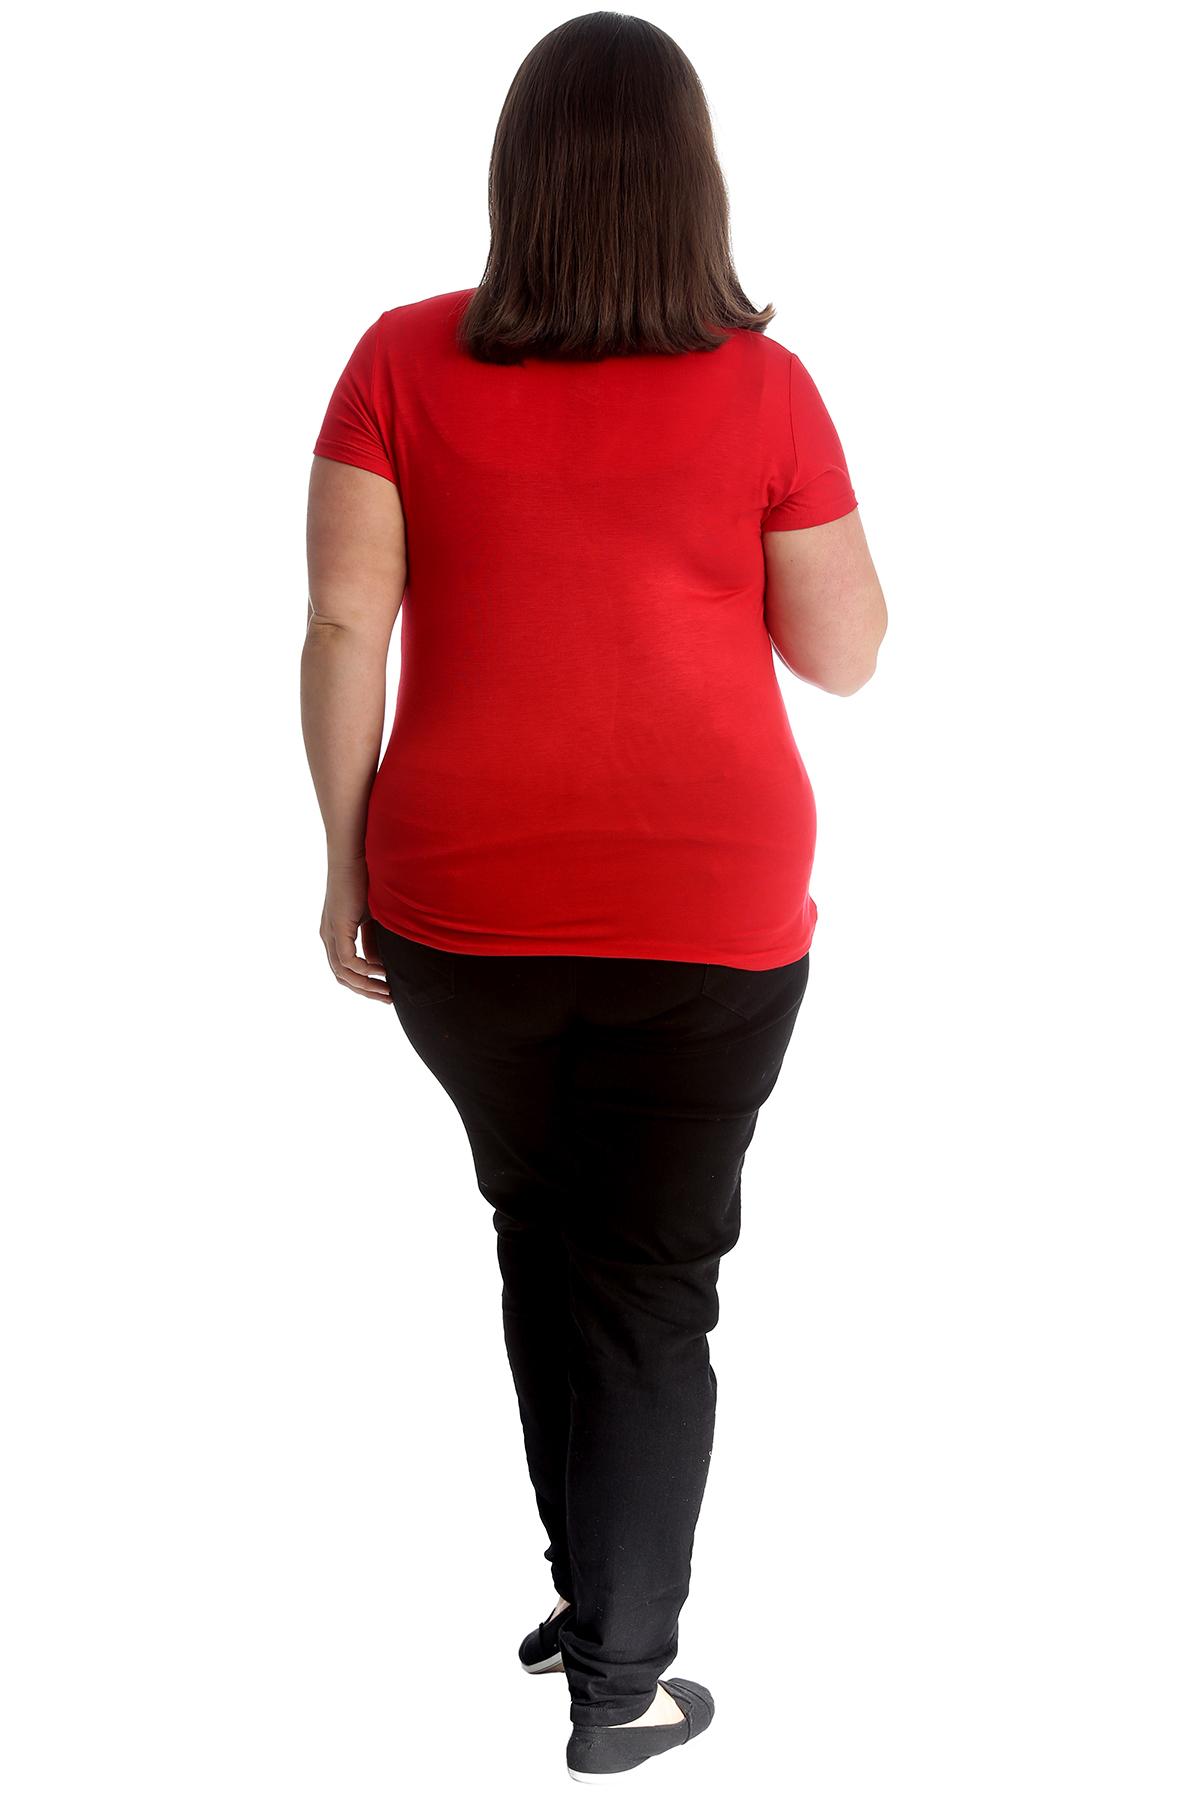 New-Womens-Plus-Size-Top-Ladies-Cherry-Rhinestone-T-Shirt-Soft-Stud-Shiny-Hip thumbnail 14